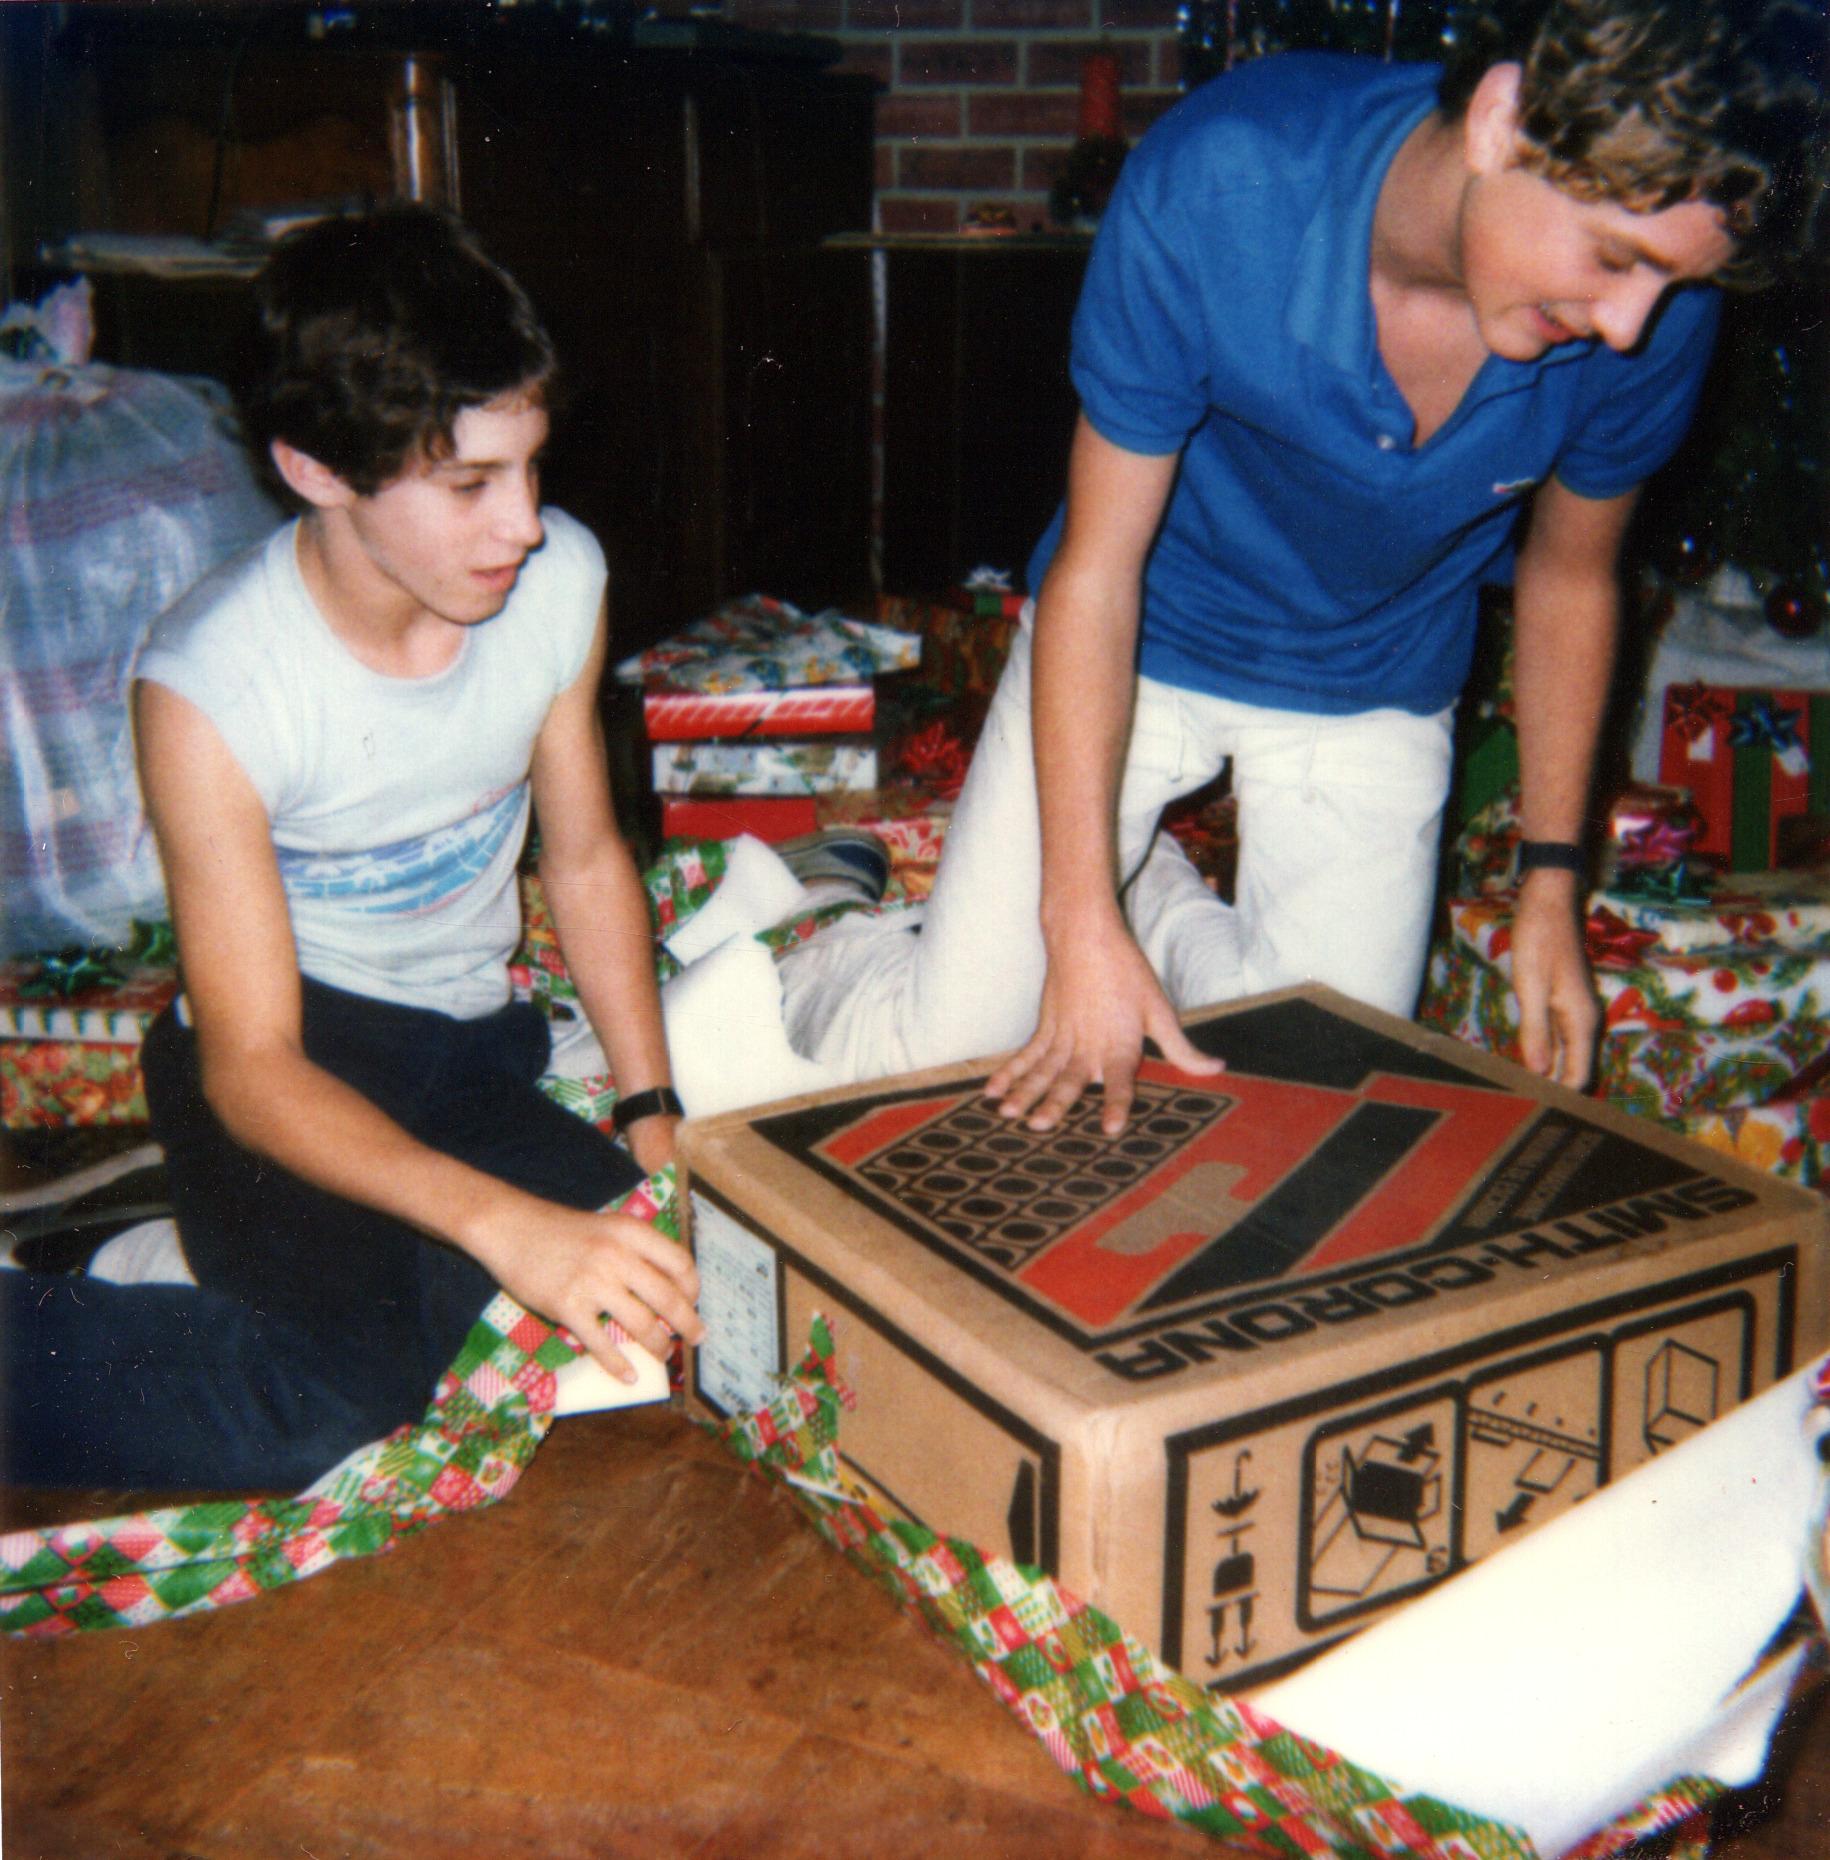 Tom & Ken at Christmas